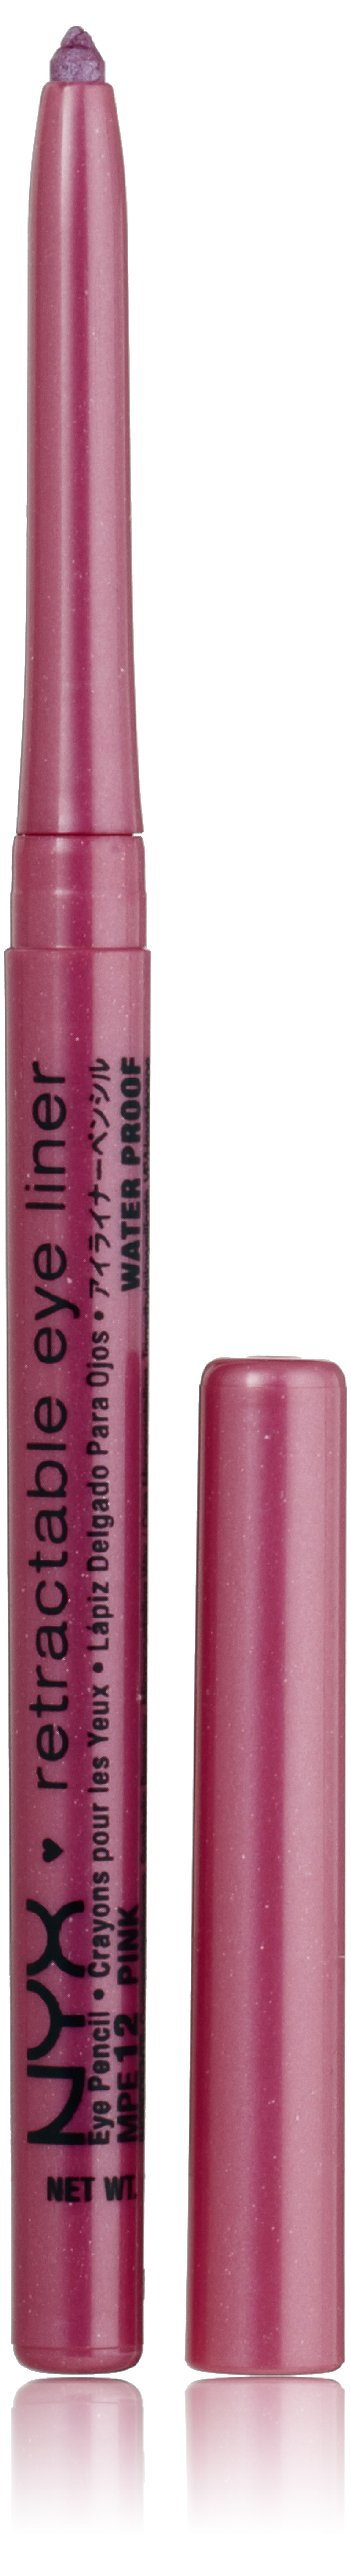 NYX Mechanical Eye Pencil, Pink